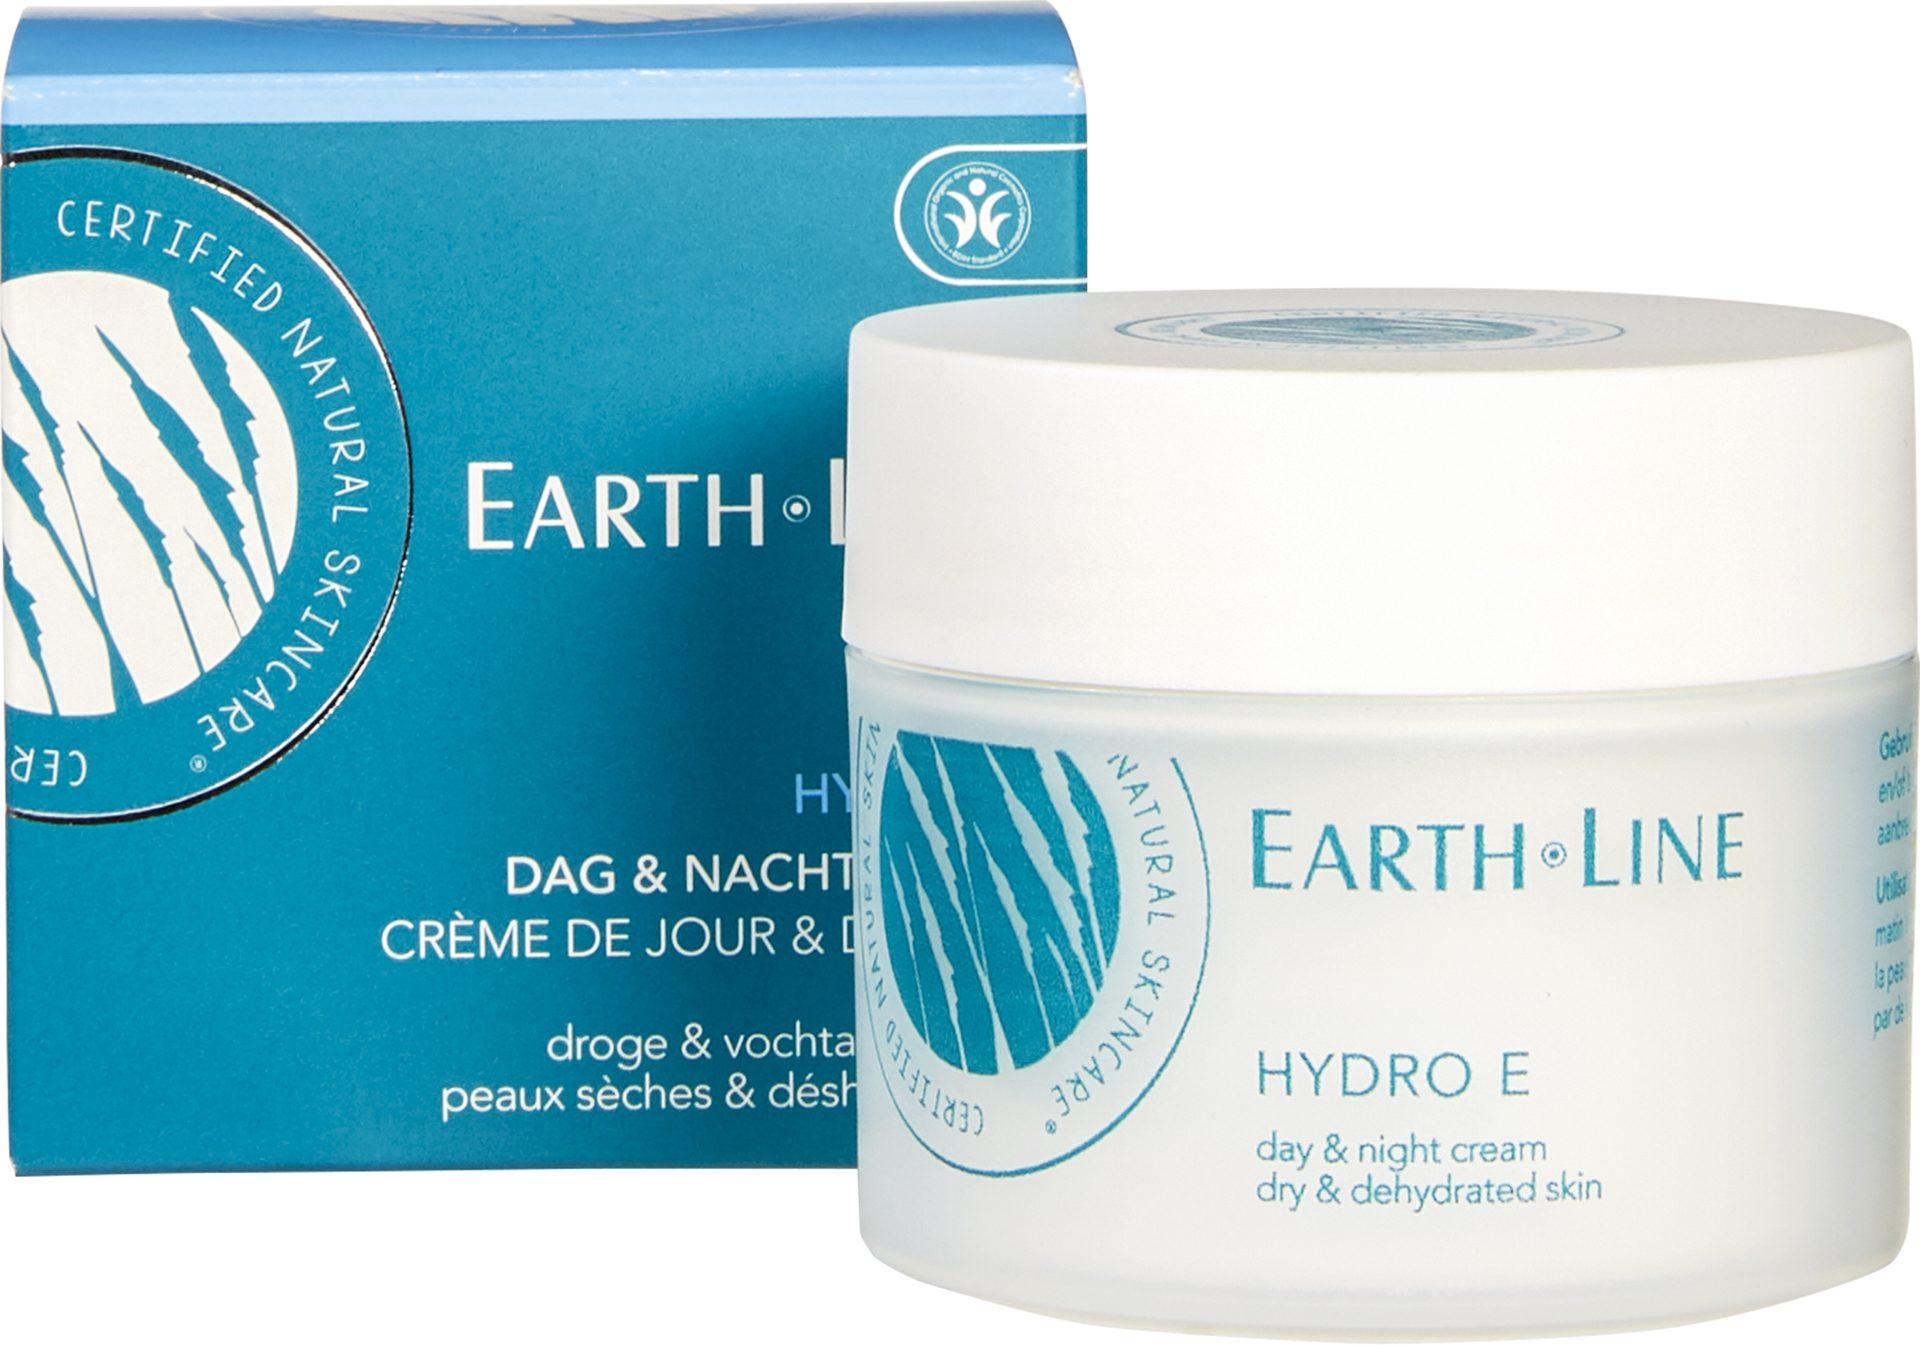 Biologische Earth.Line Dag- en nachtcrème hydro e - droge huid 50 ml